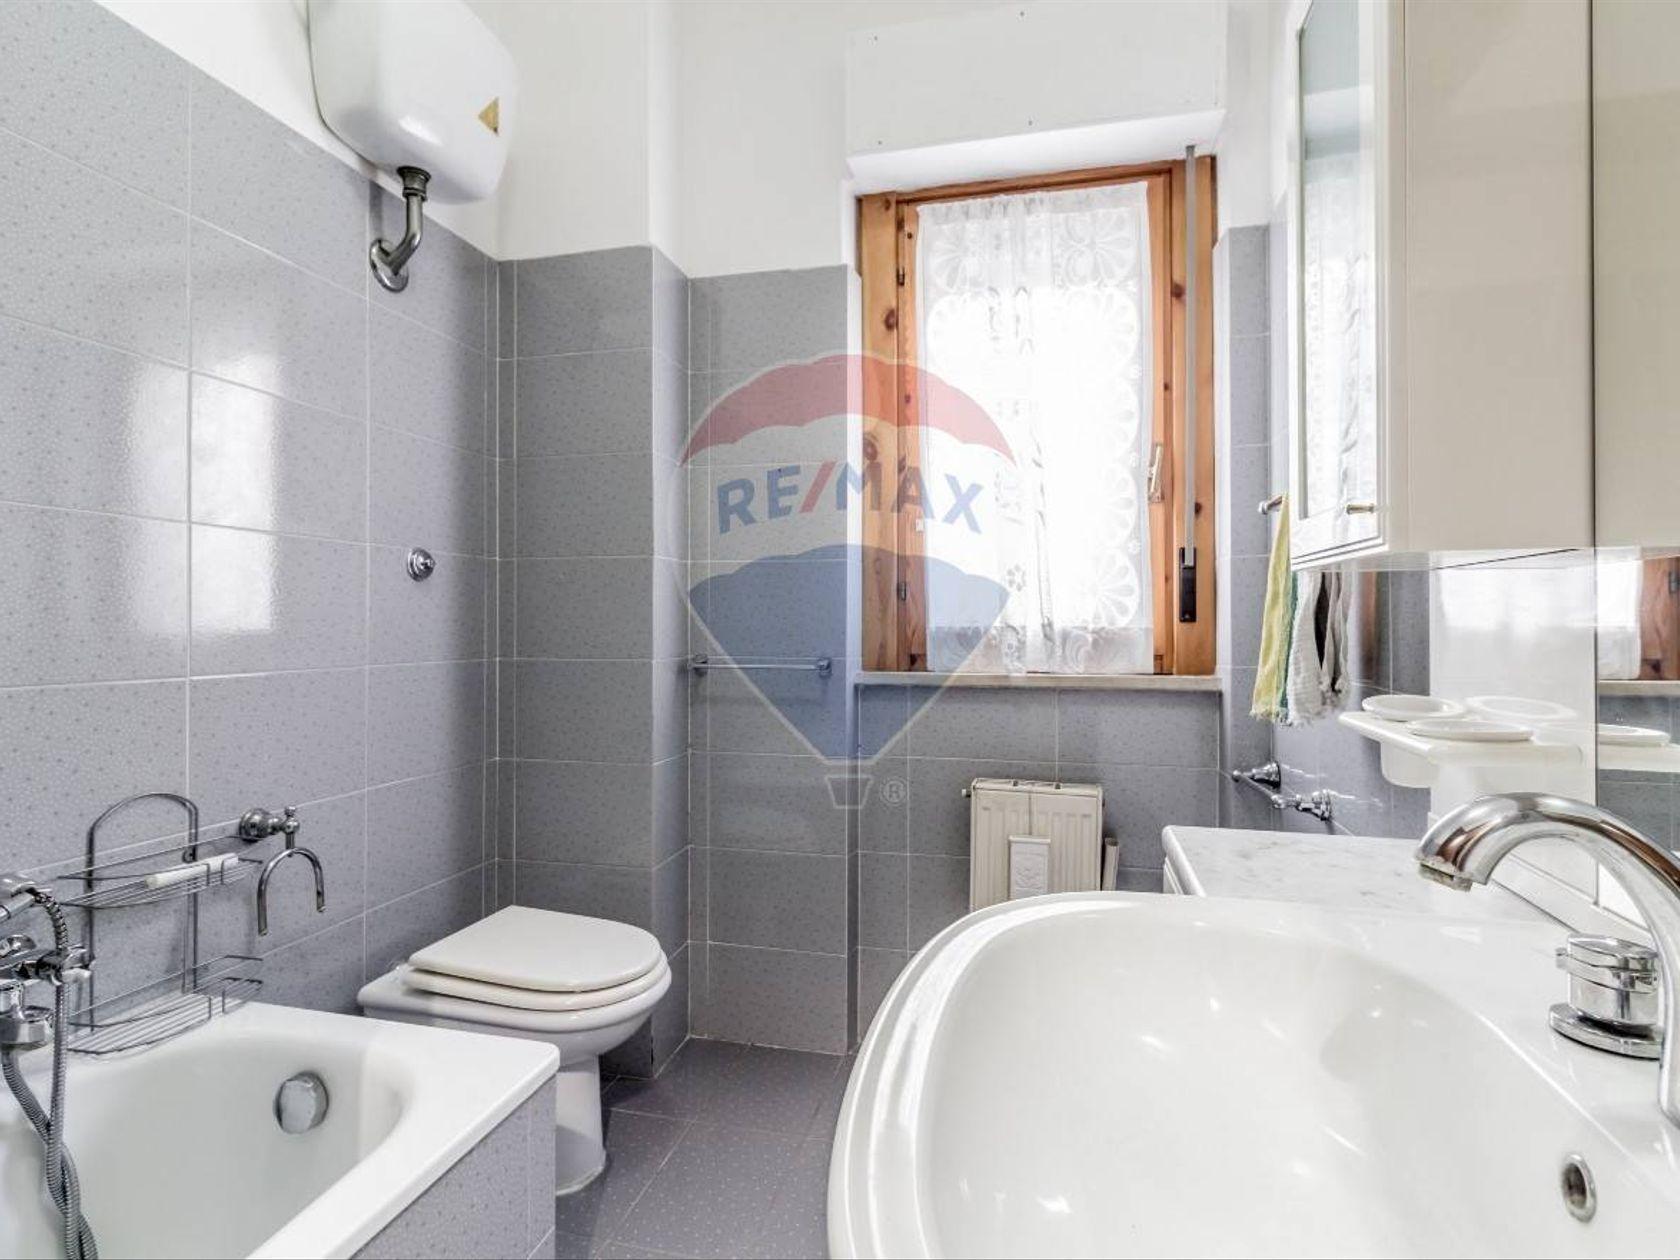 Appartamento Villa Adriana, Tivoli, RM Vendita - Foto 18